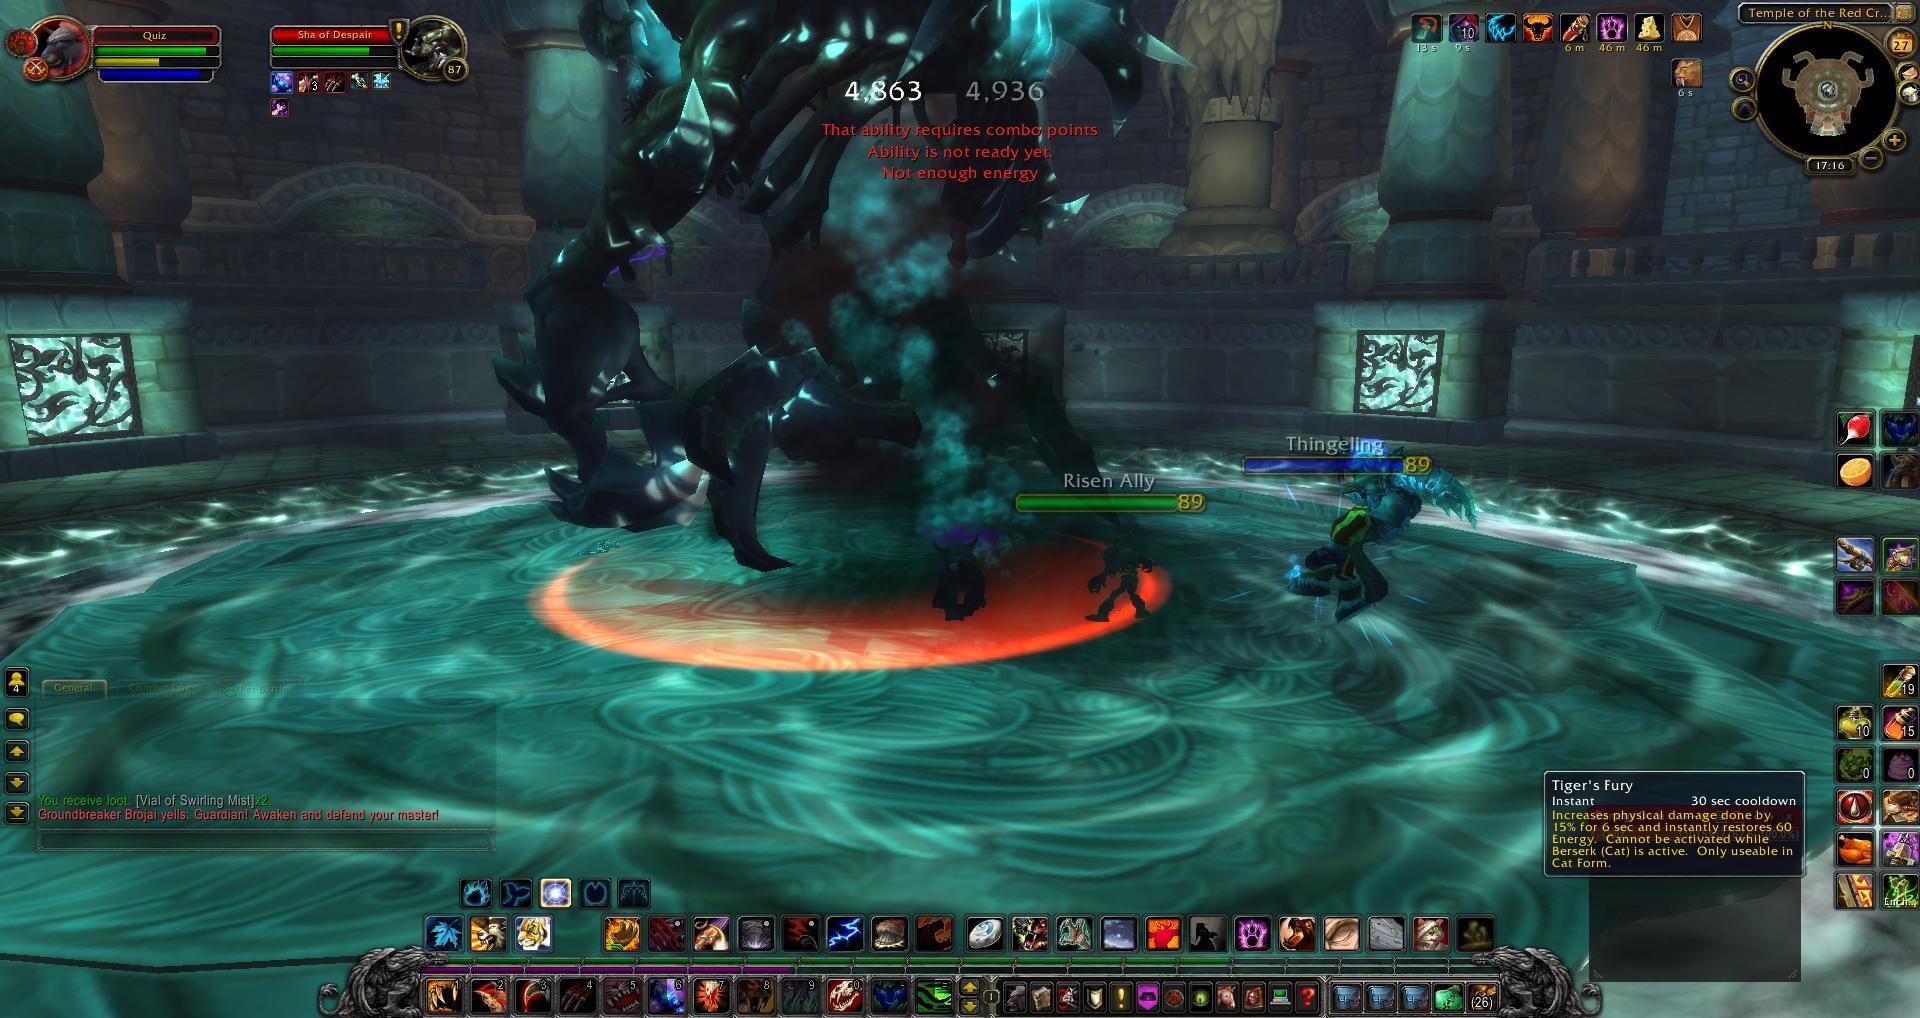 Sha of Despair wow wow screenshot - Gamingcfg.com